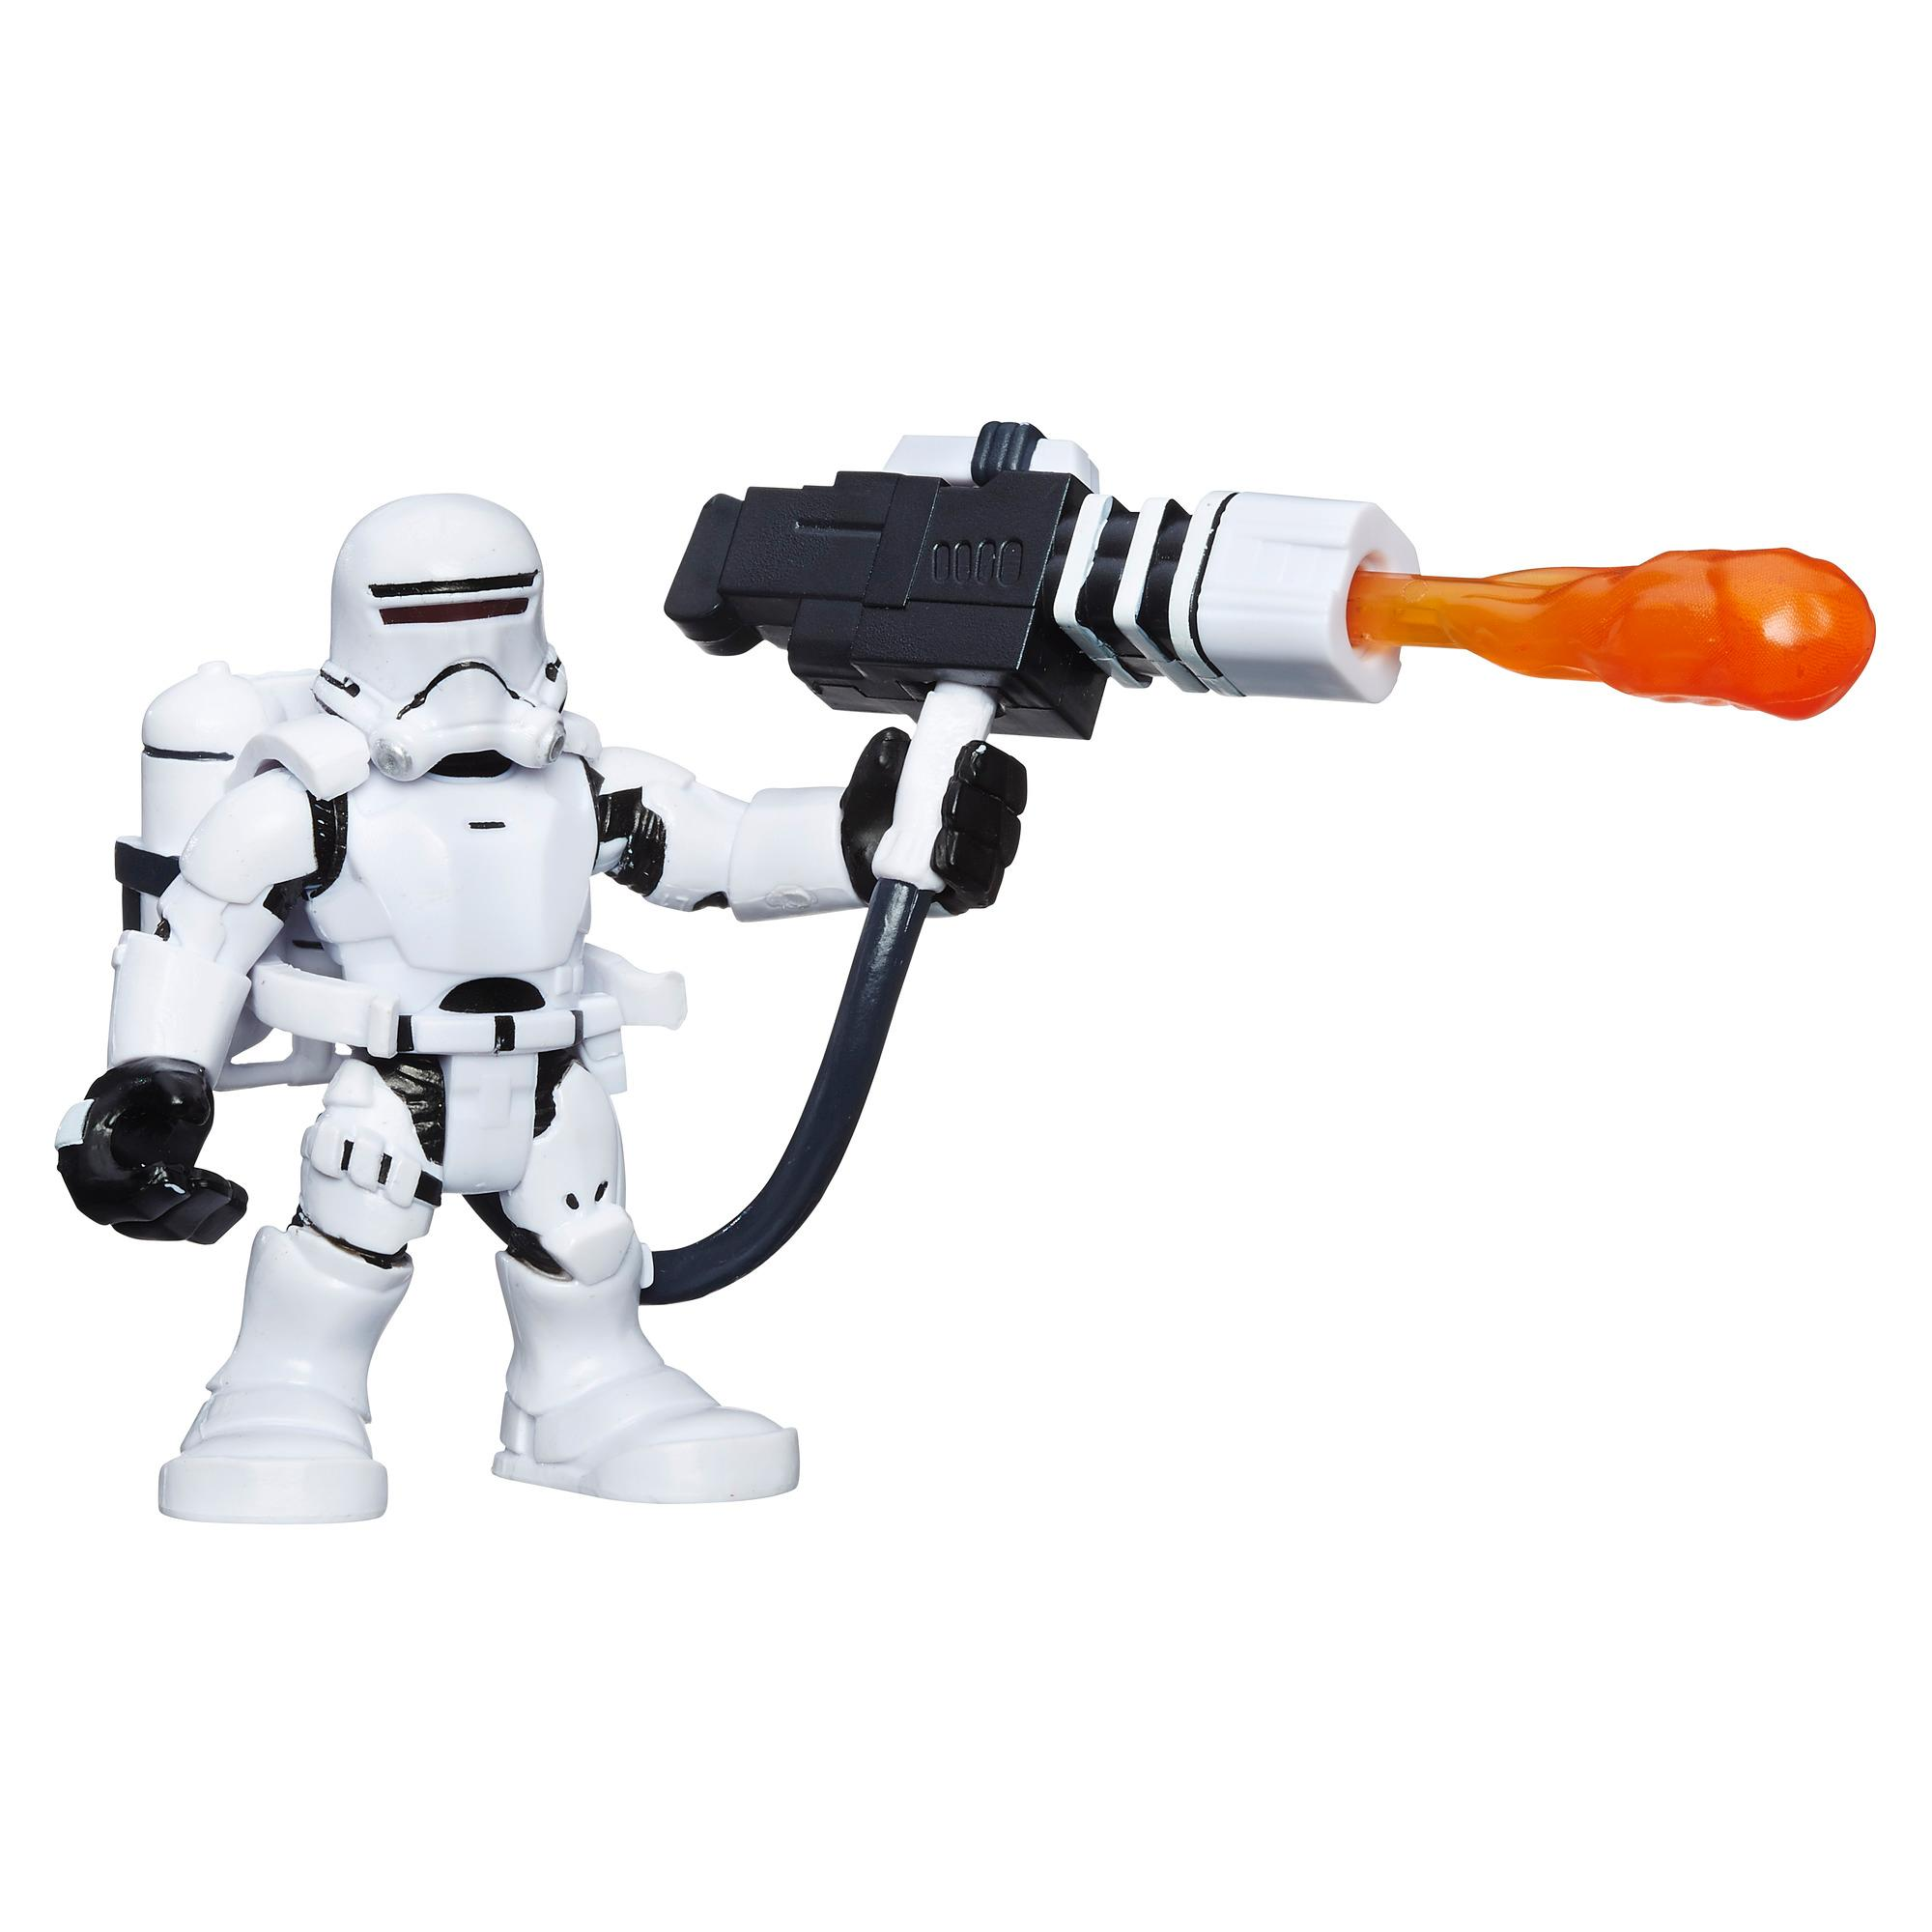 Galactic Heroes Star Wars Toys 65